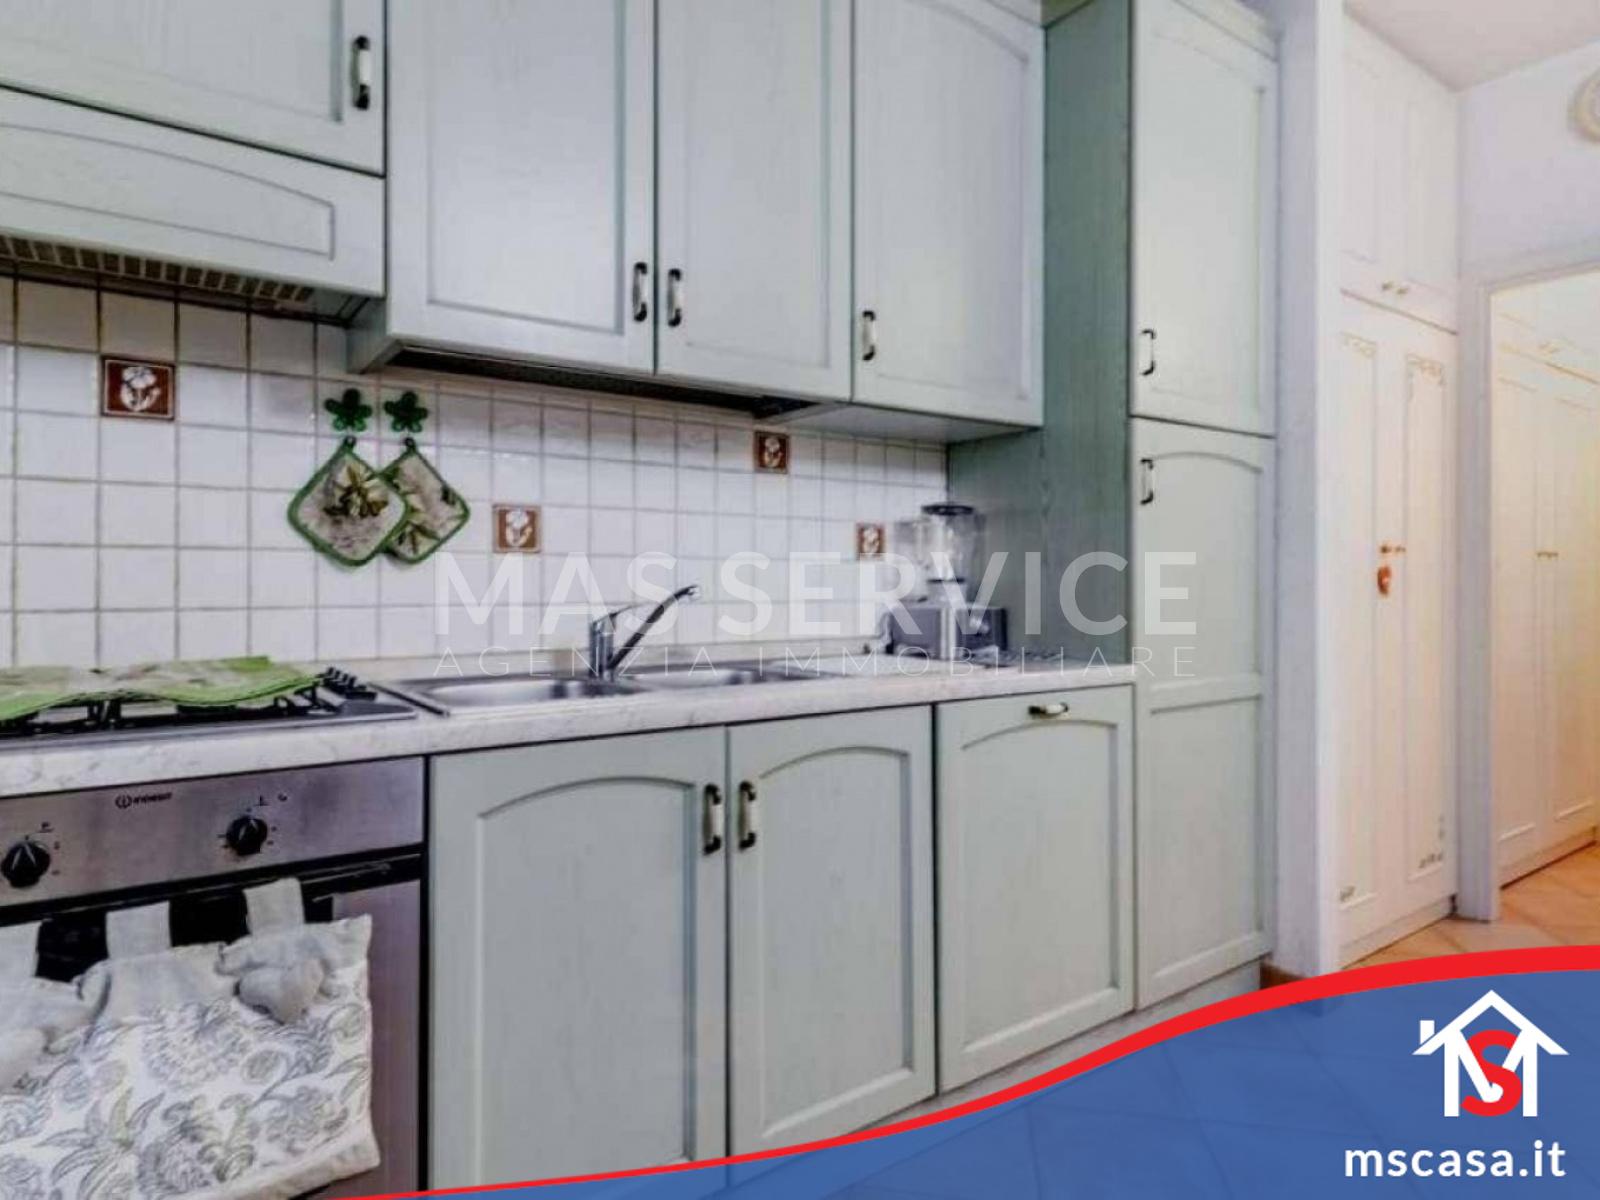 Bilocale in vendita zona Mostacciano a Roma Vista Cucina